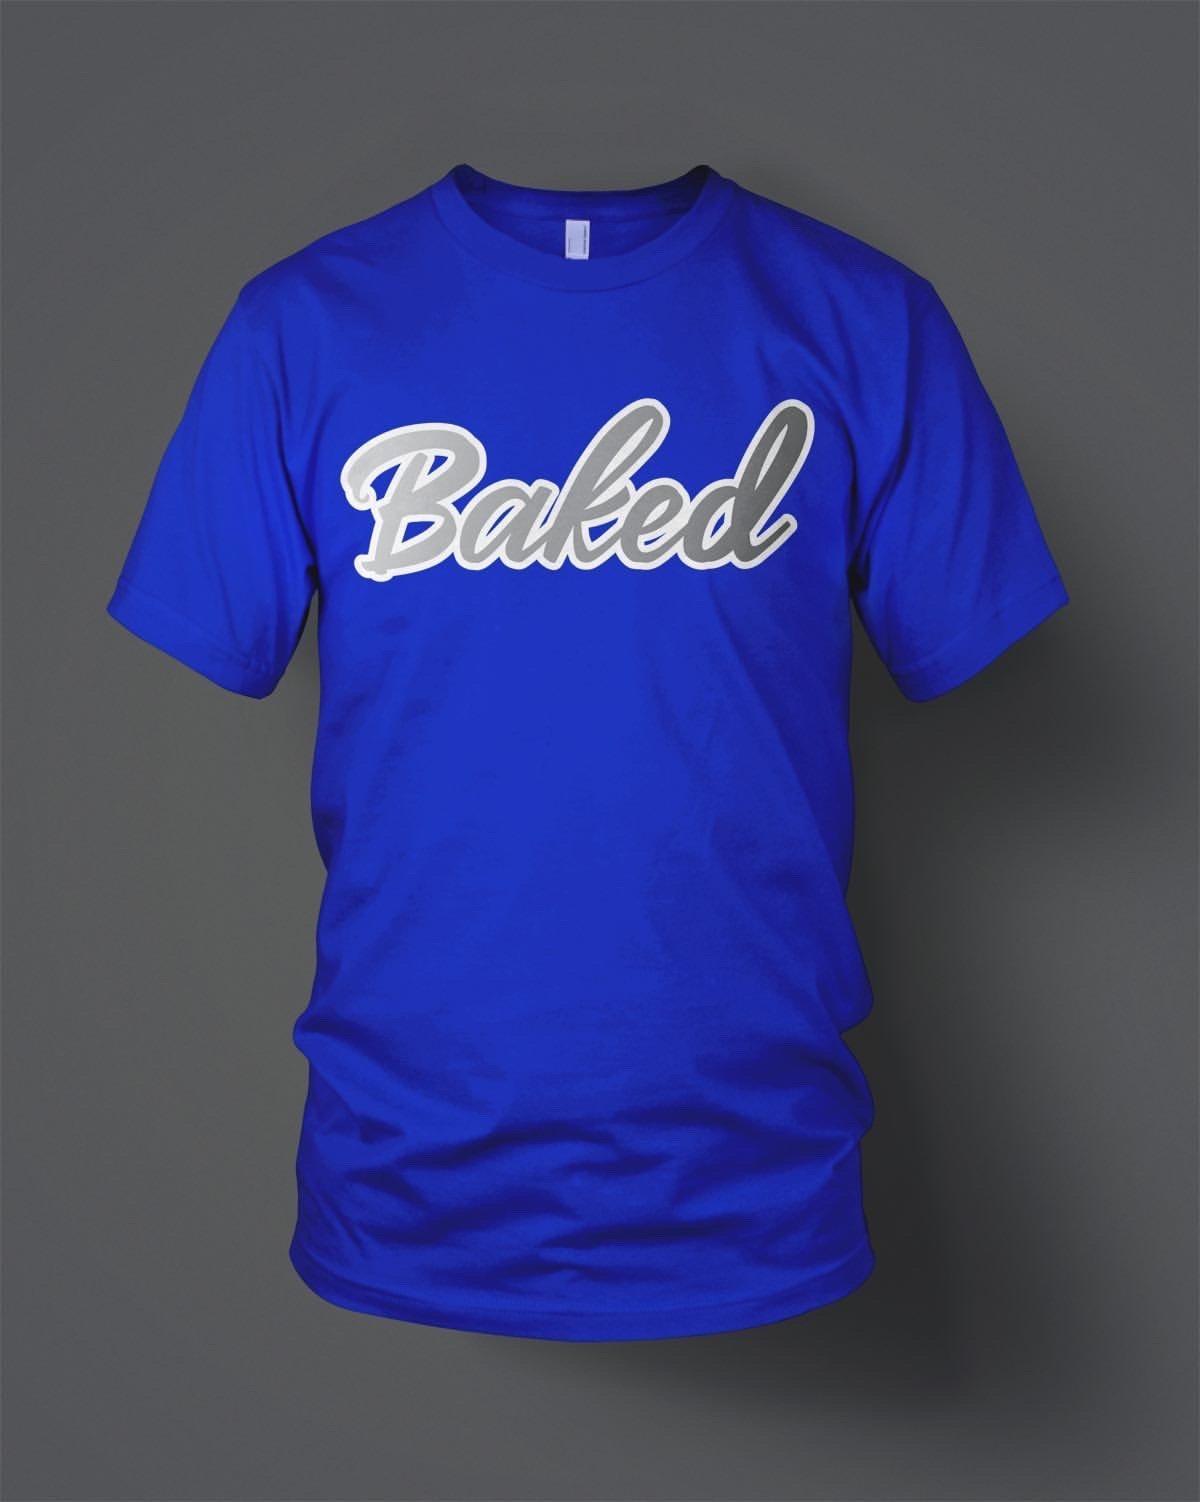 Blu Baked